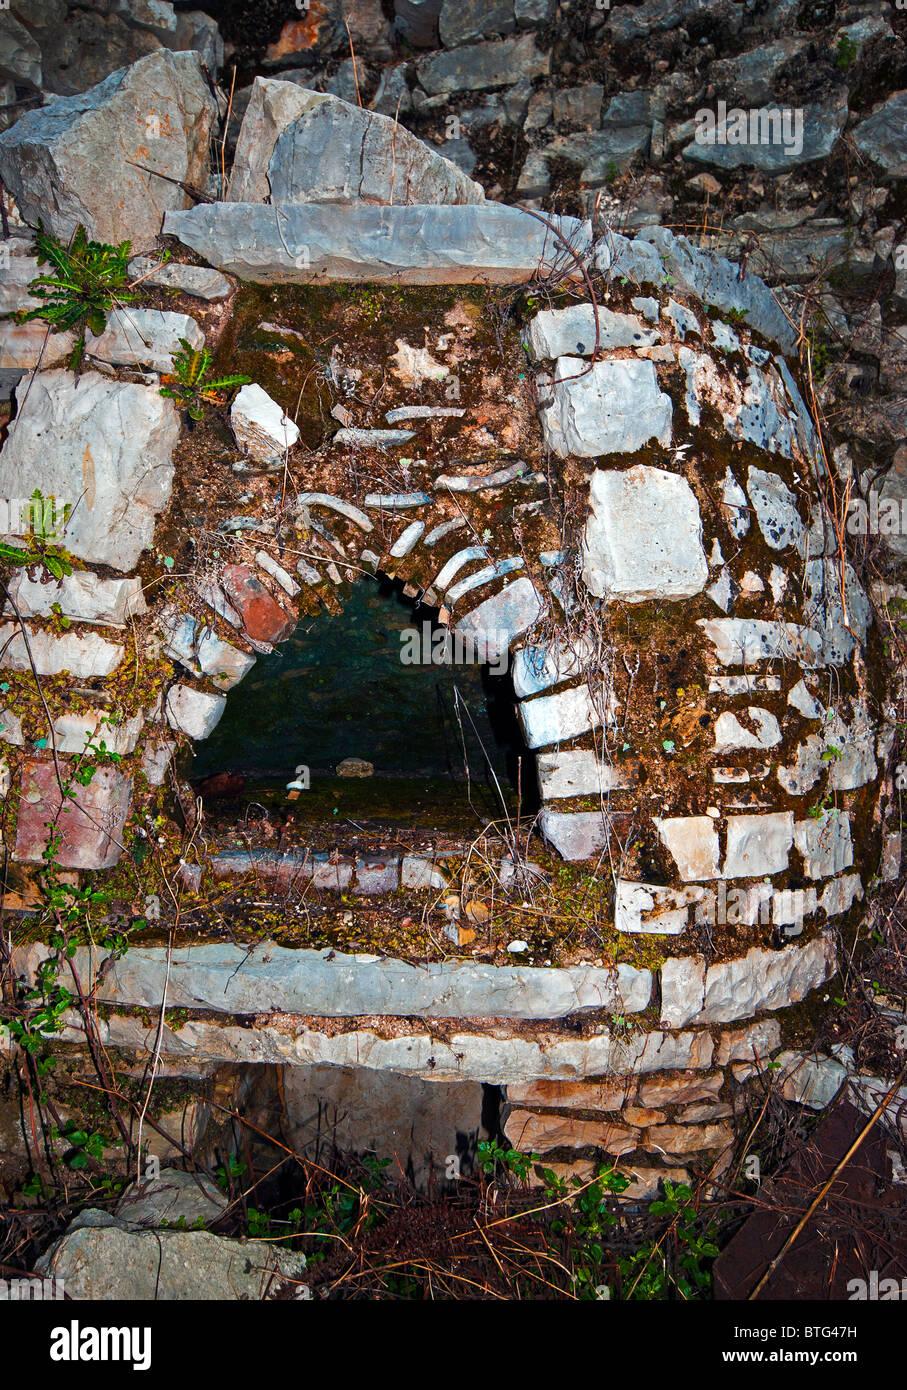 Fireplace at Old Perithia, Ionian Islands, Corfu Greece. - Stock Image